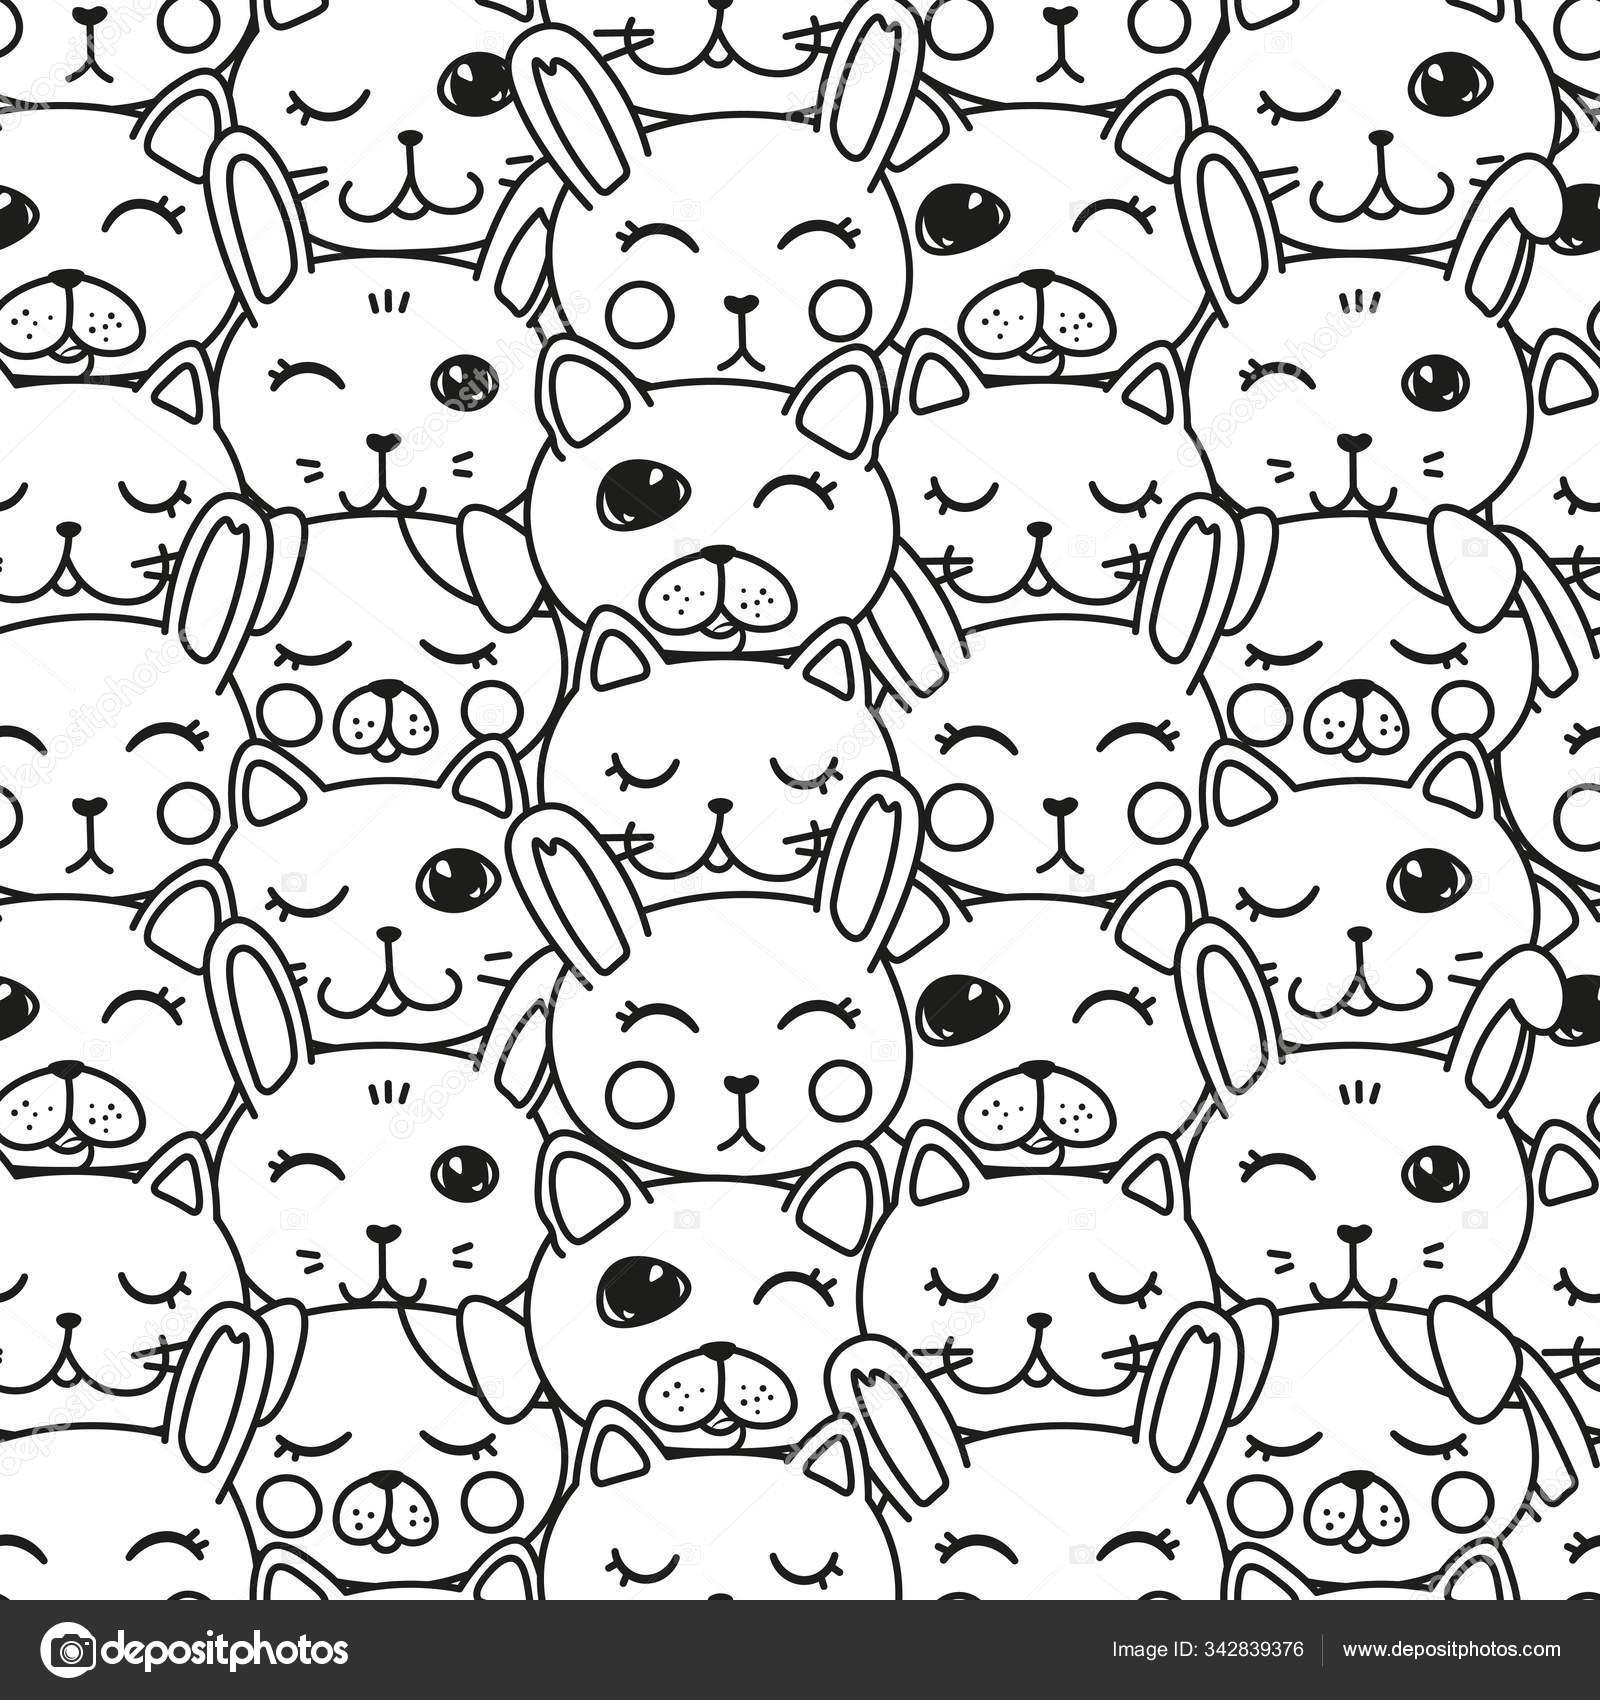 Kawaii Doodle Pets Black White Seamless Cute Domestic Animals Lovely Stock Vector C Yanicorn 342839376